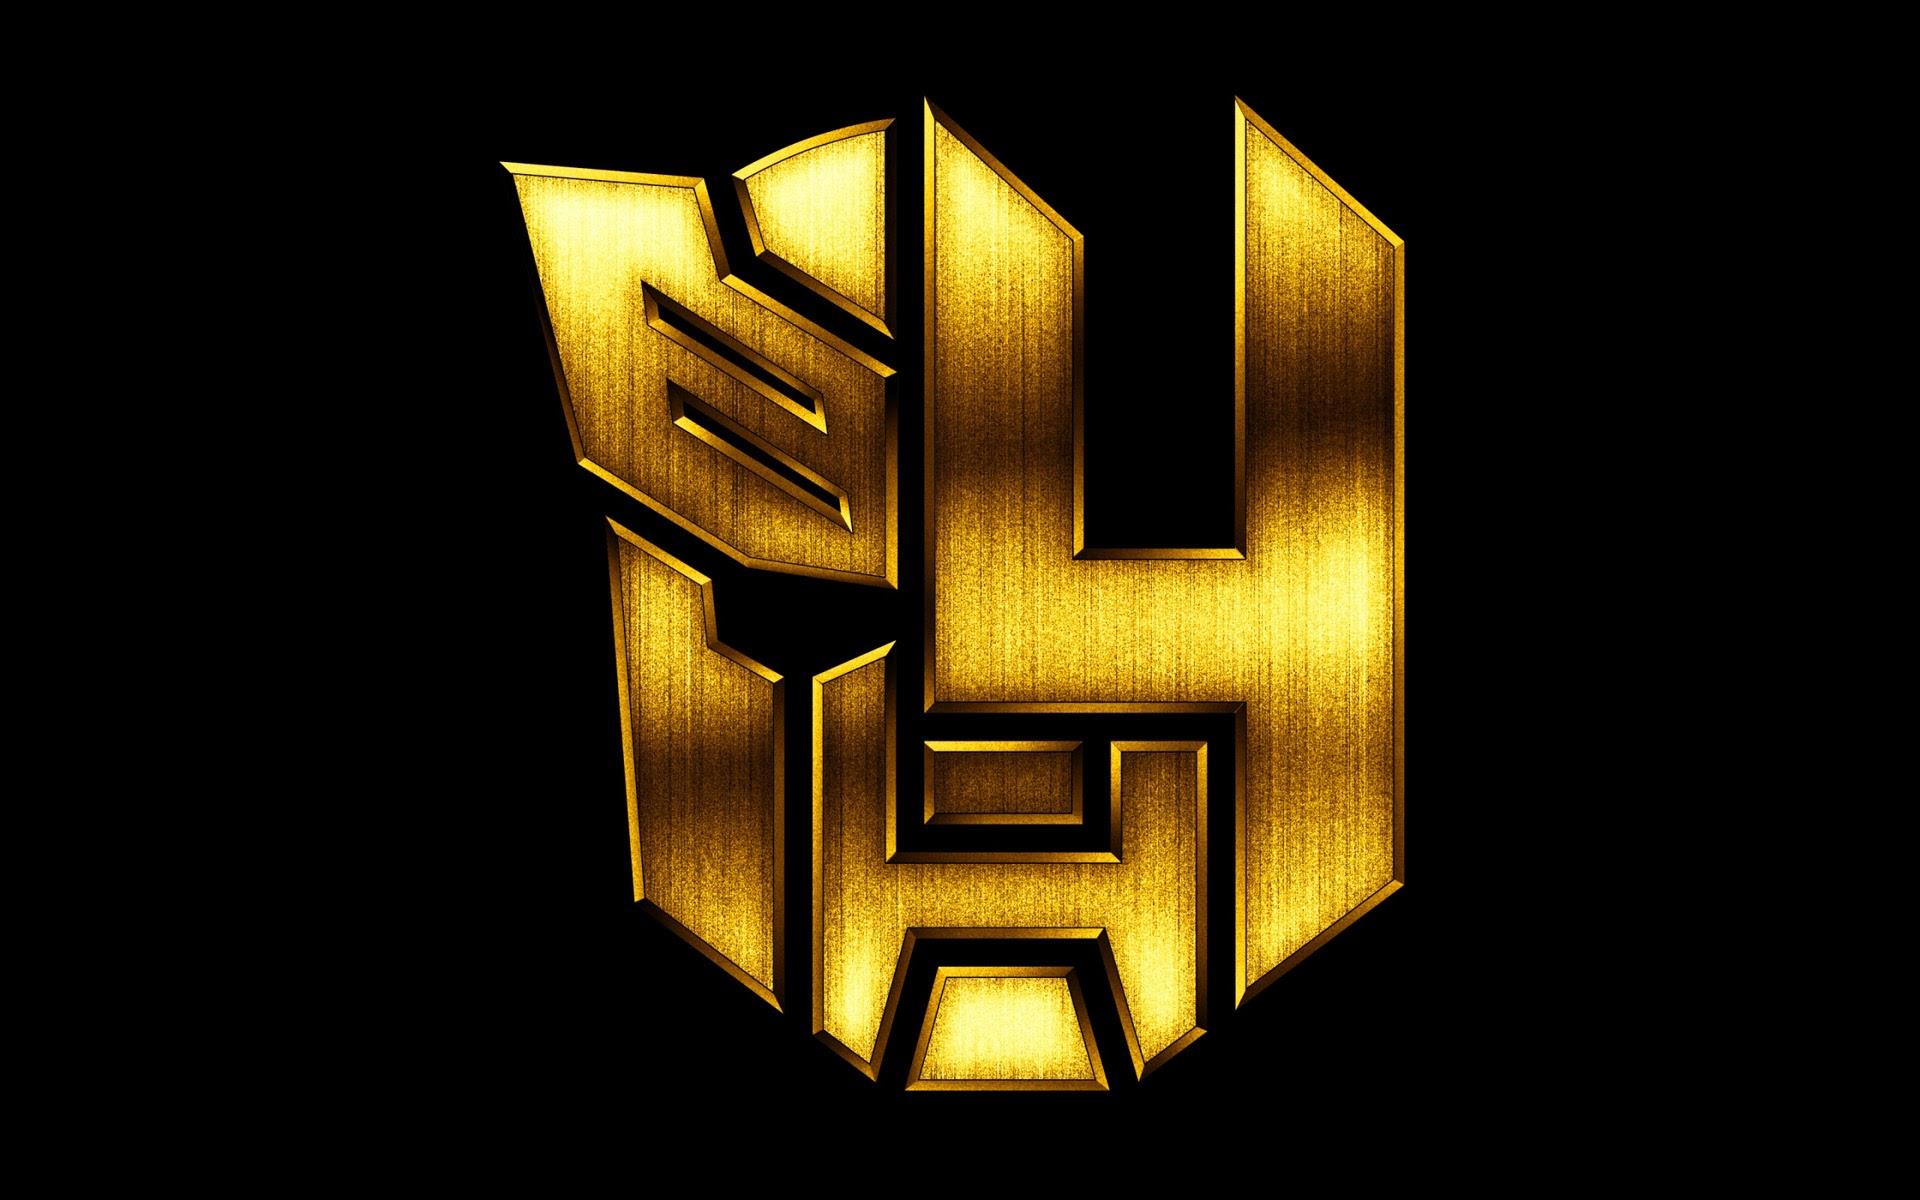 Transformer 4 Logo Autobot 2014 4b Wallpaper HD 1920x1200